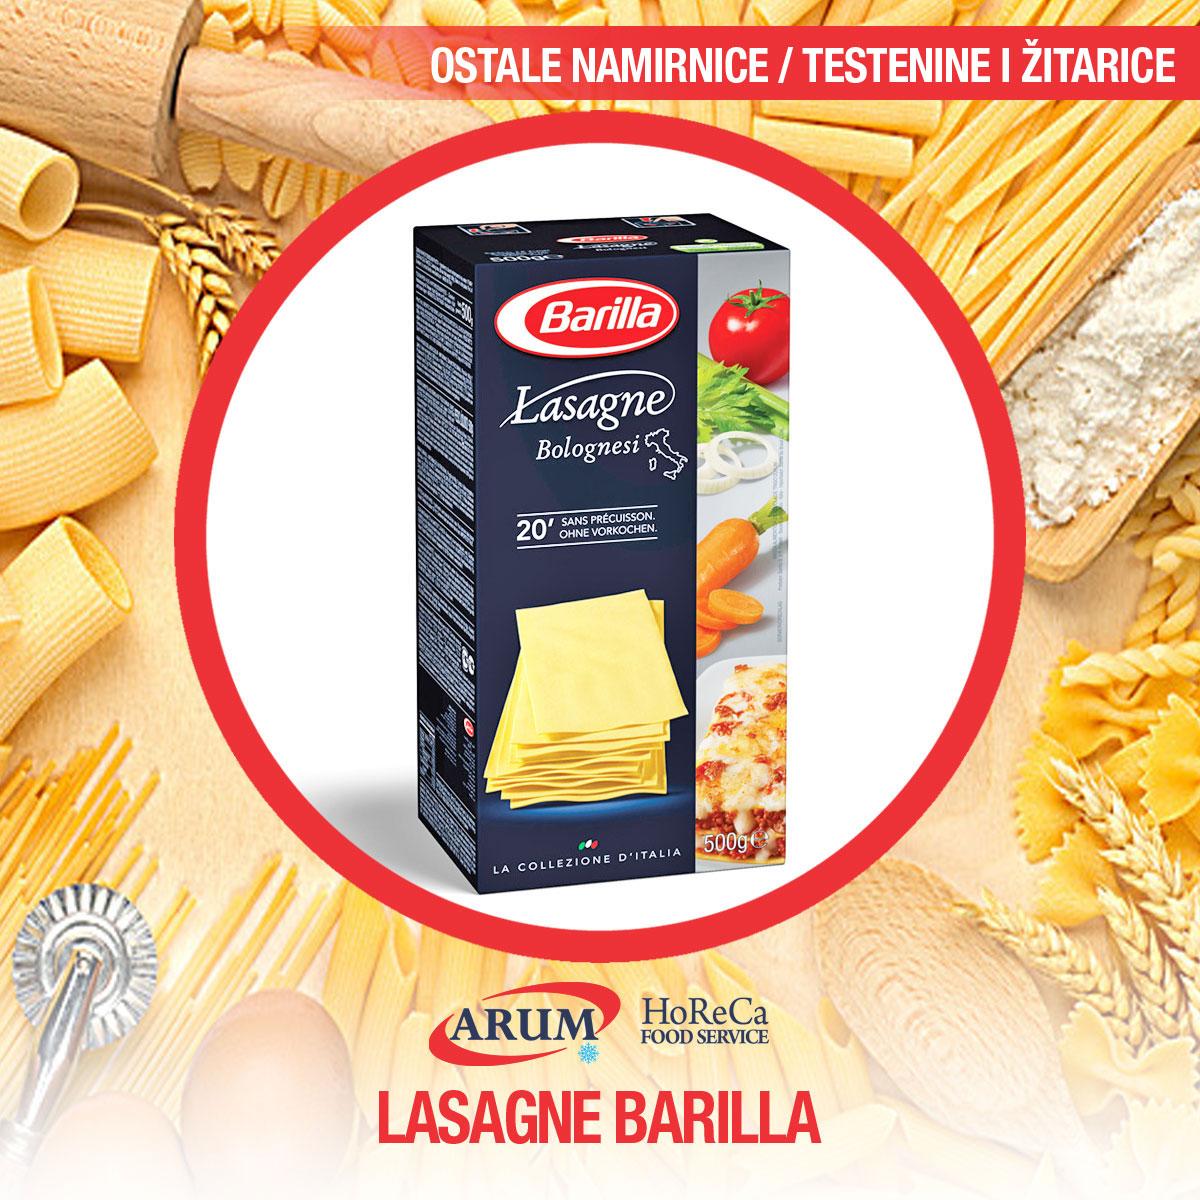 Lasagne barilla 500g